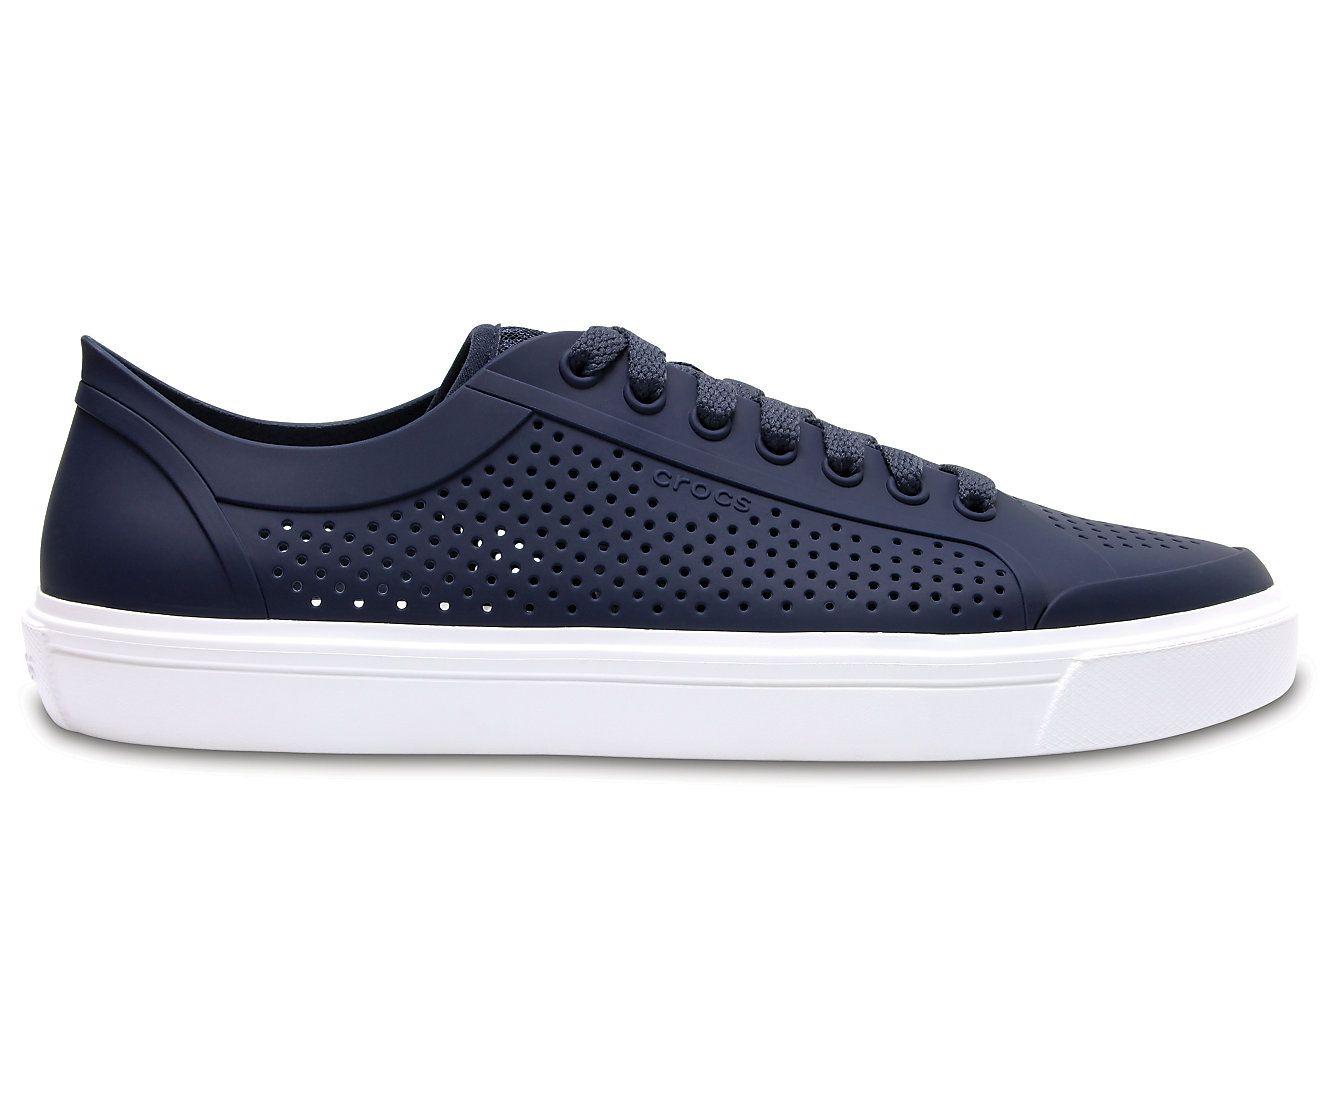 b2cf0bf5d606 Crocs Citilane Roka Court Lifestyle Navy Casual Shoes - Buy Crocs ...